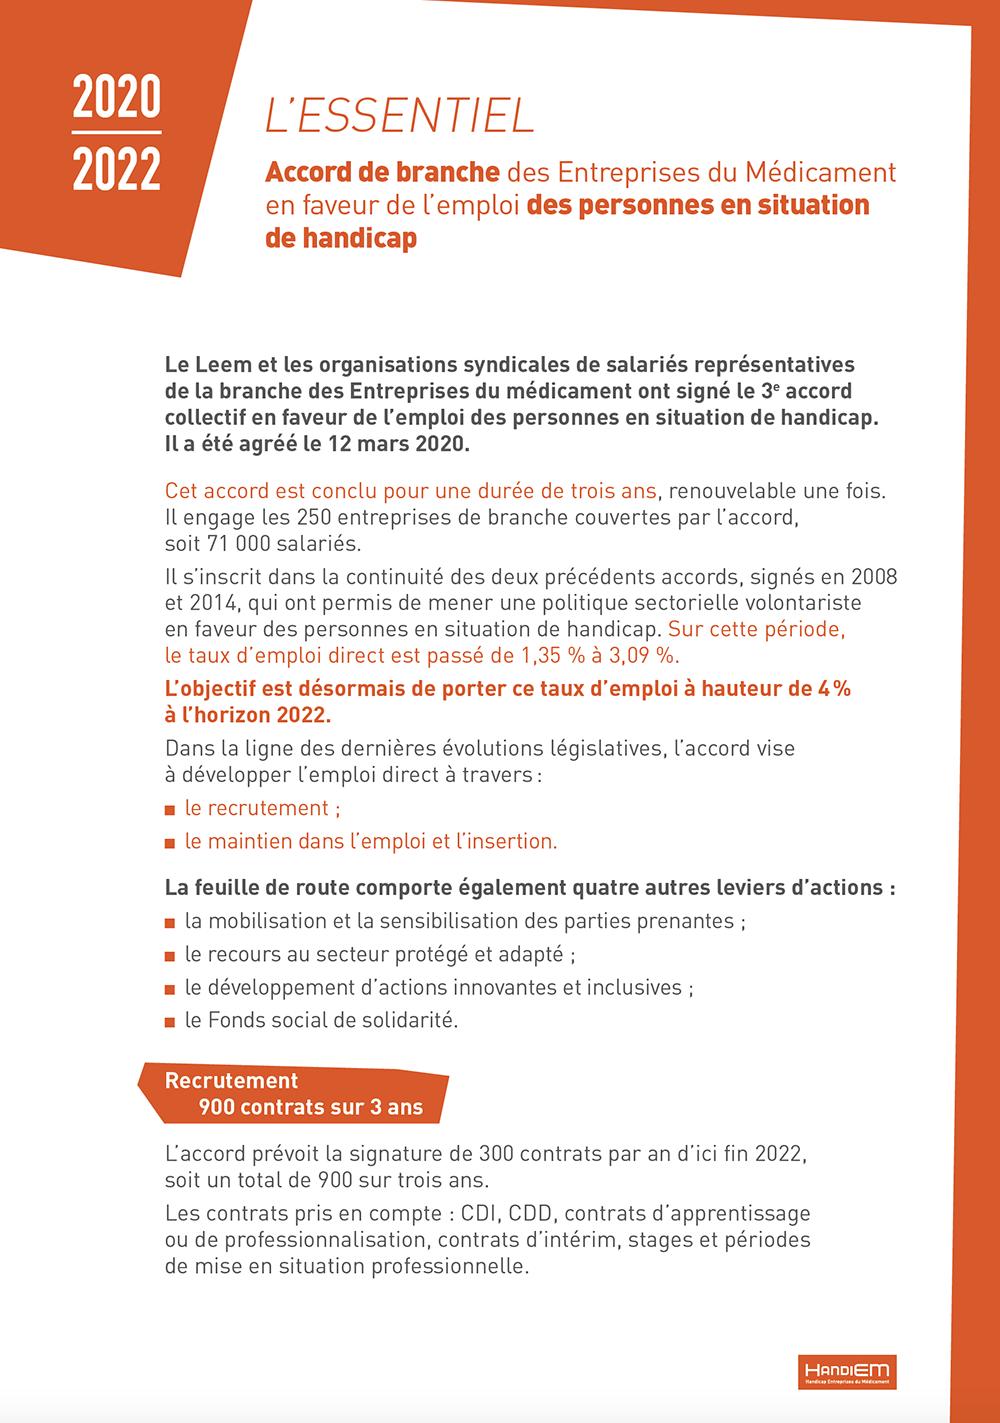 HandiEM - Bilan des actions 2015